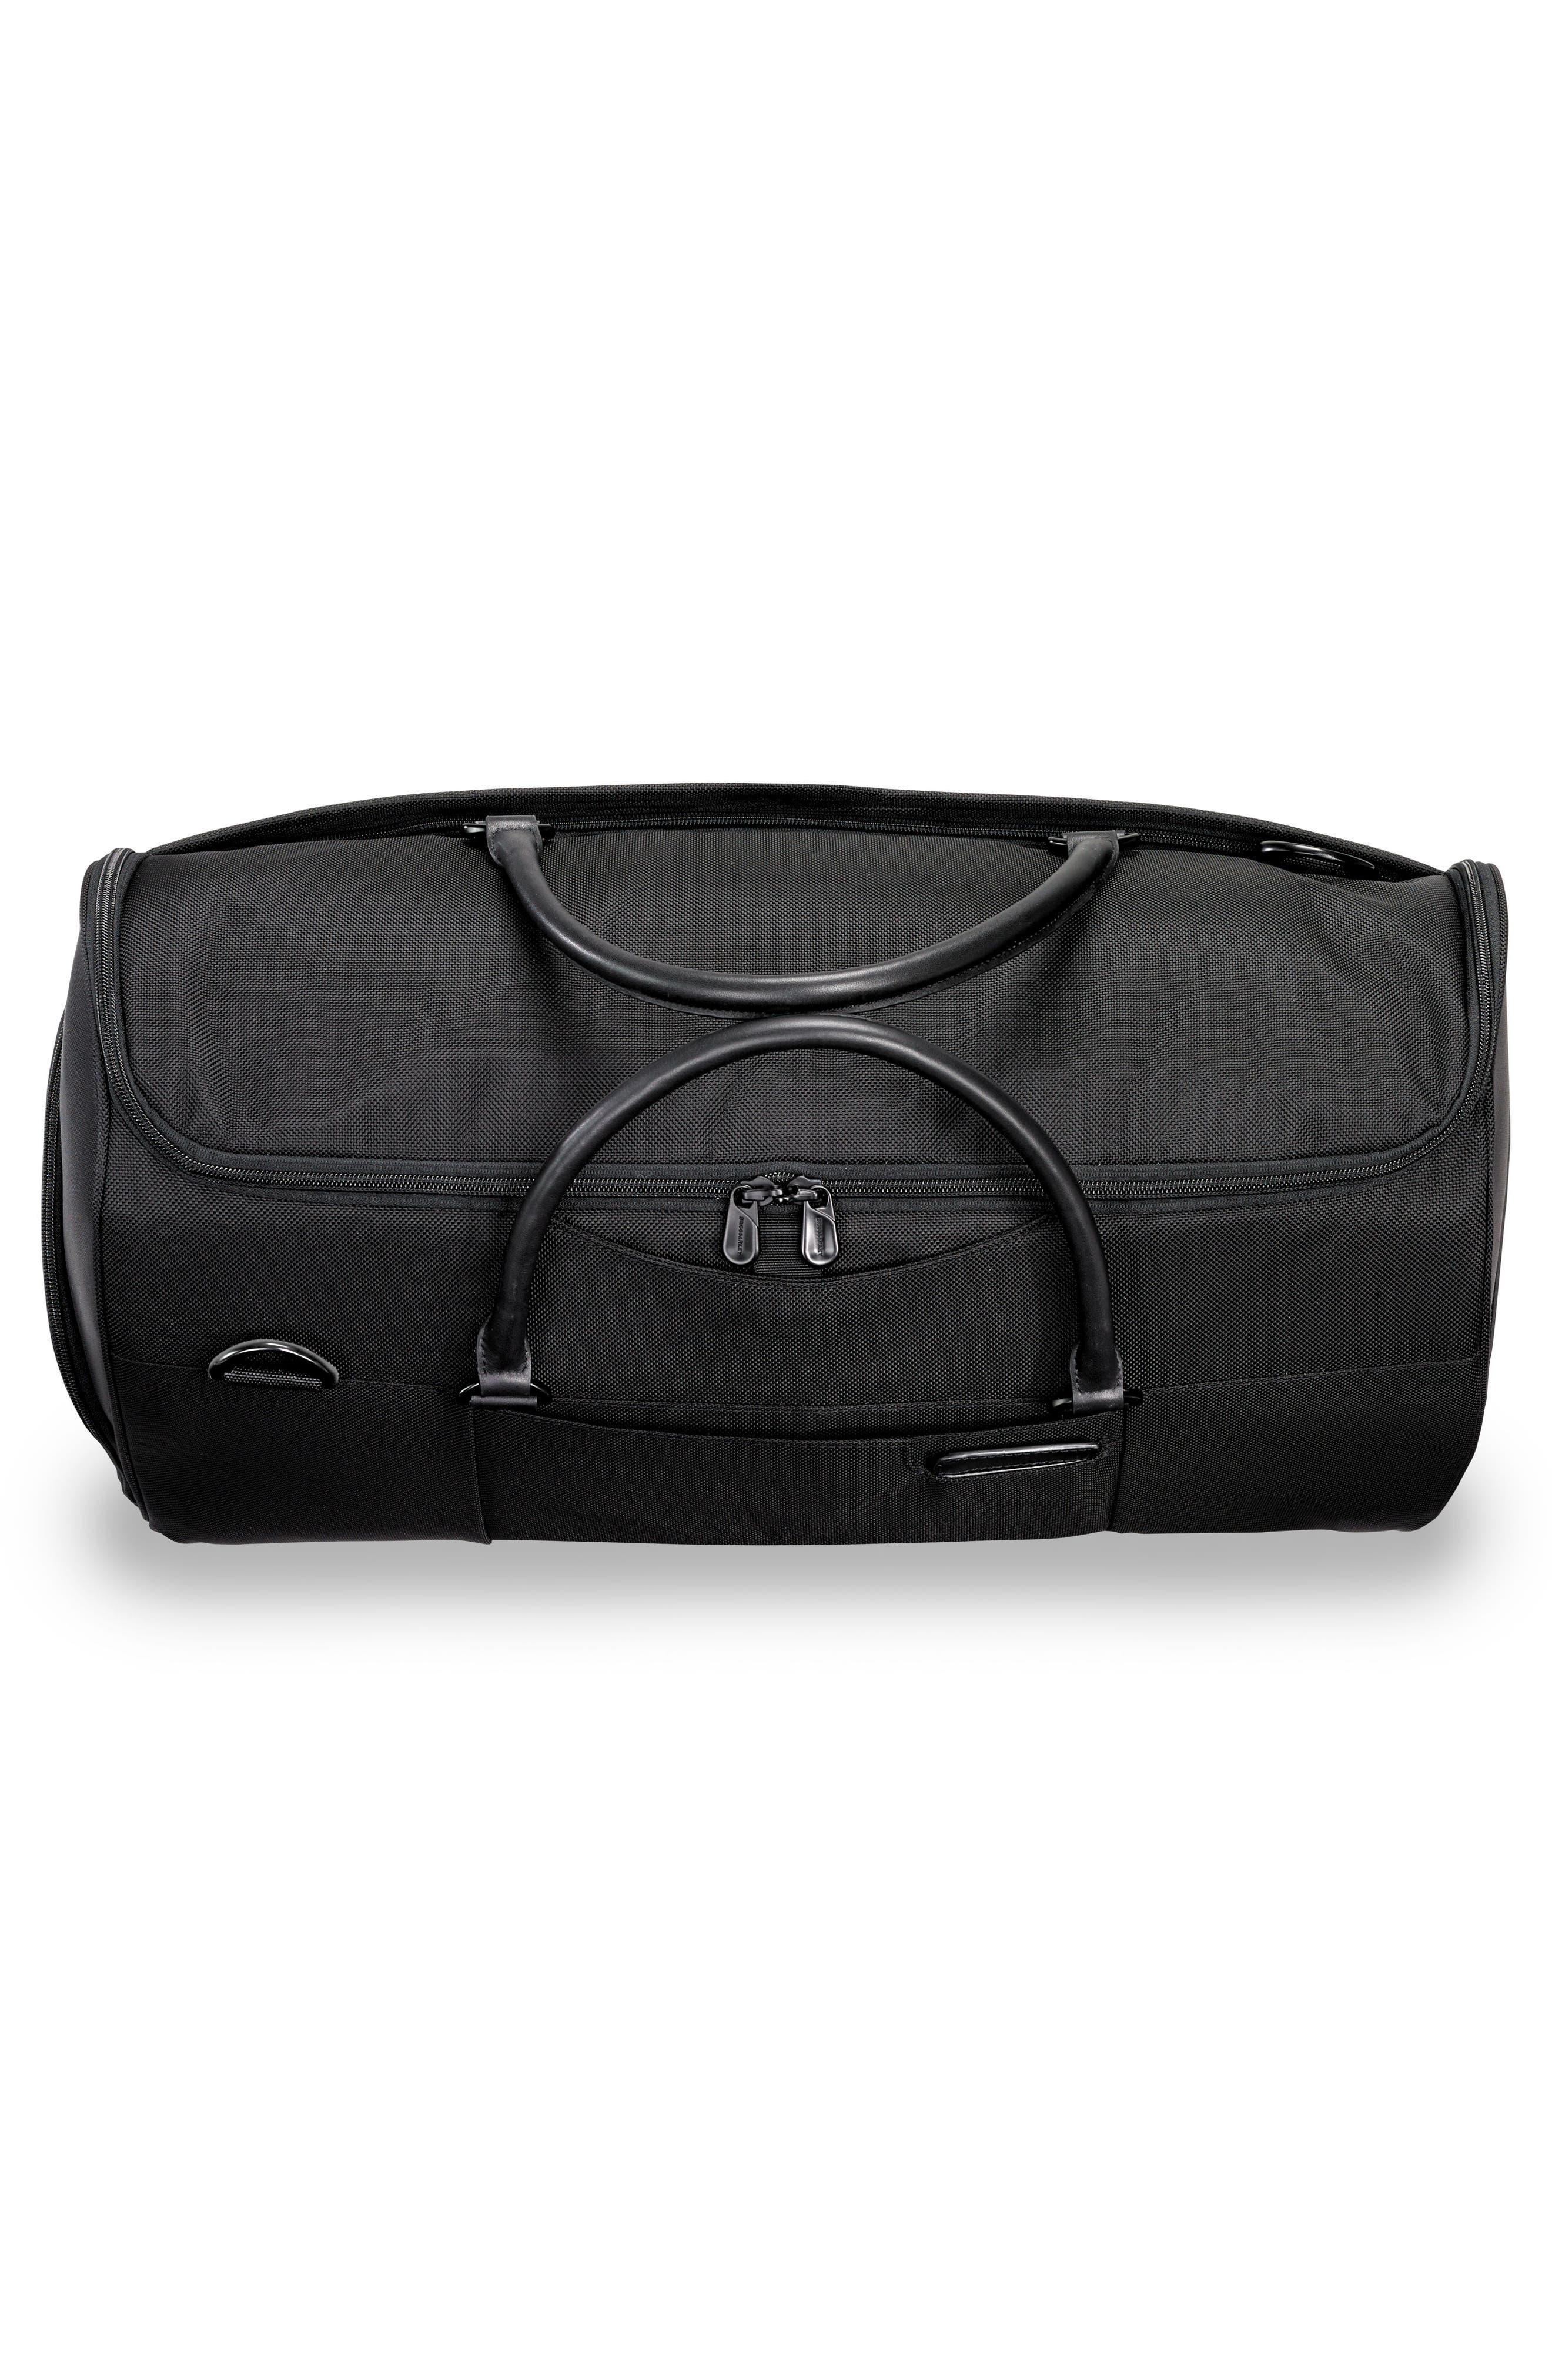 BRIGGS & RILEY,                             Baseline Suiter Duffel Bag,                             Alternate thumbnail 8, color,                             BLACK